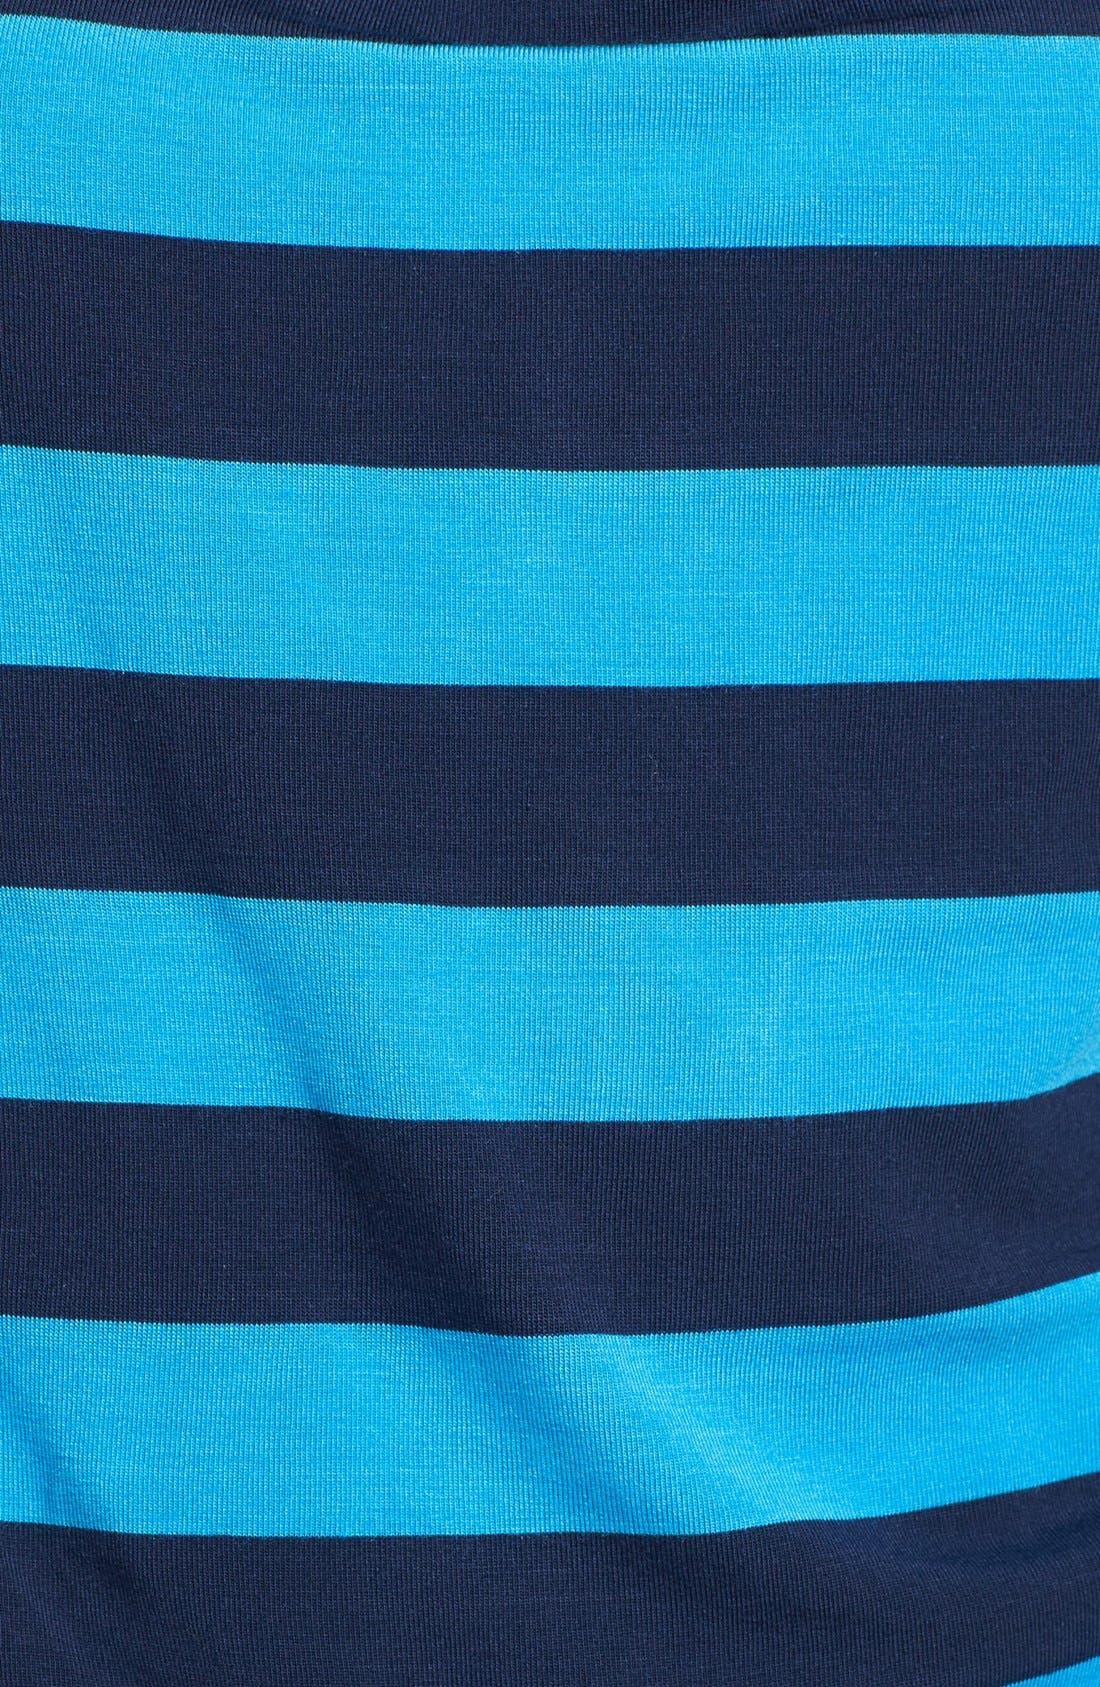 Alternate Image 3  - Caslon® Drape Neck Three Quarter Sleeve Stretch Knit Tee